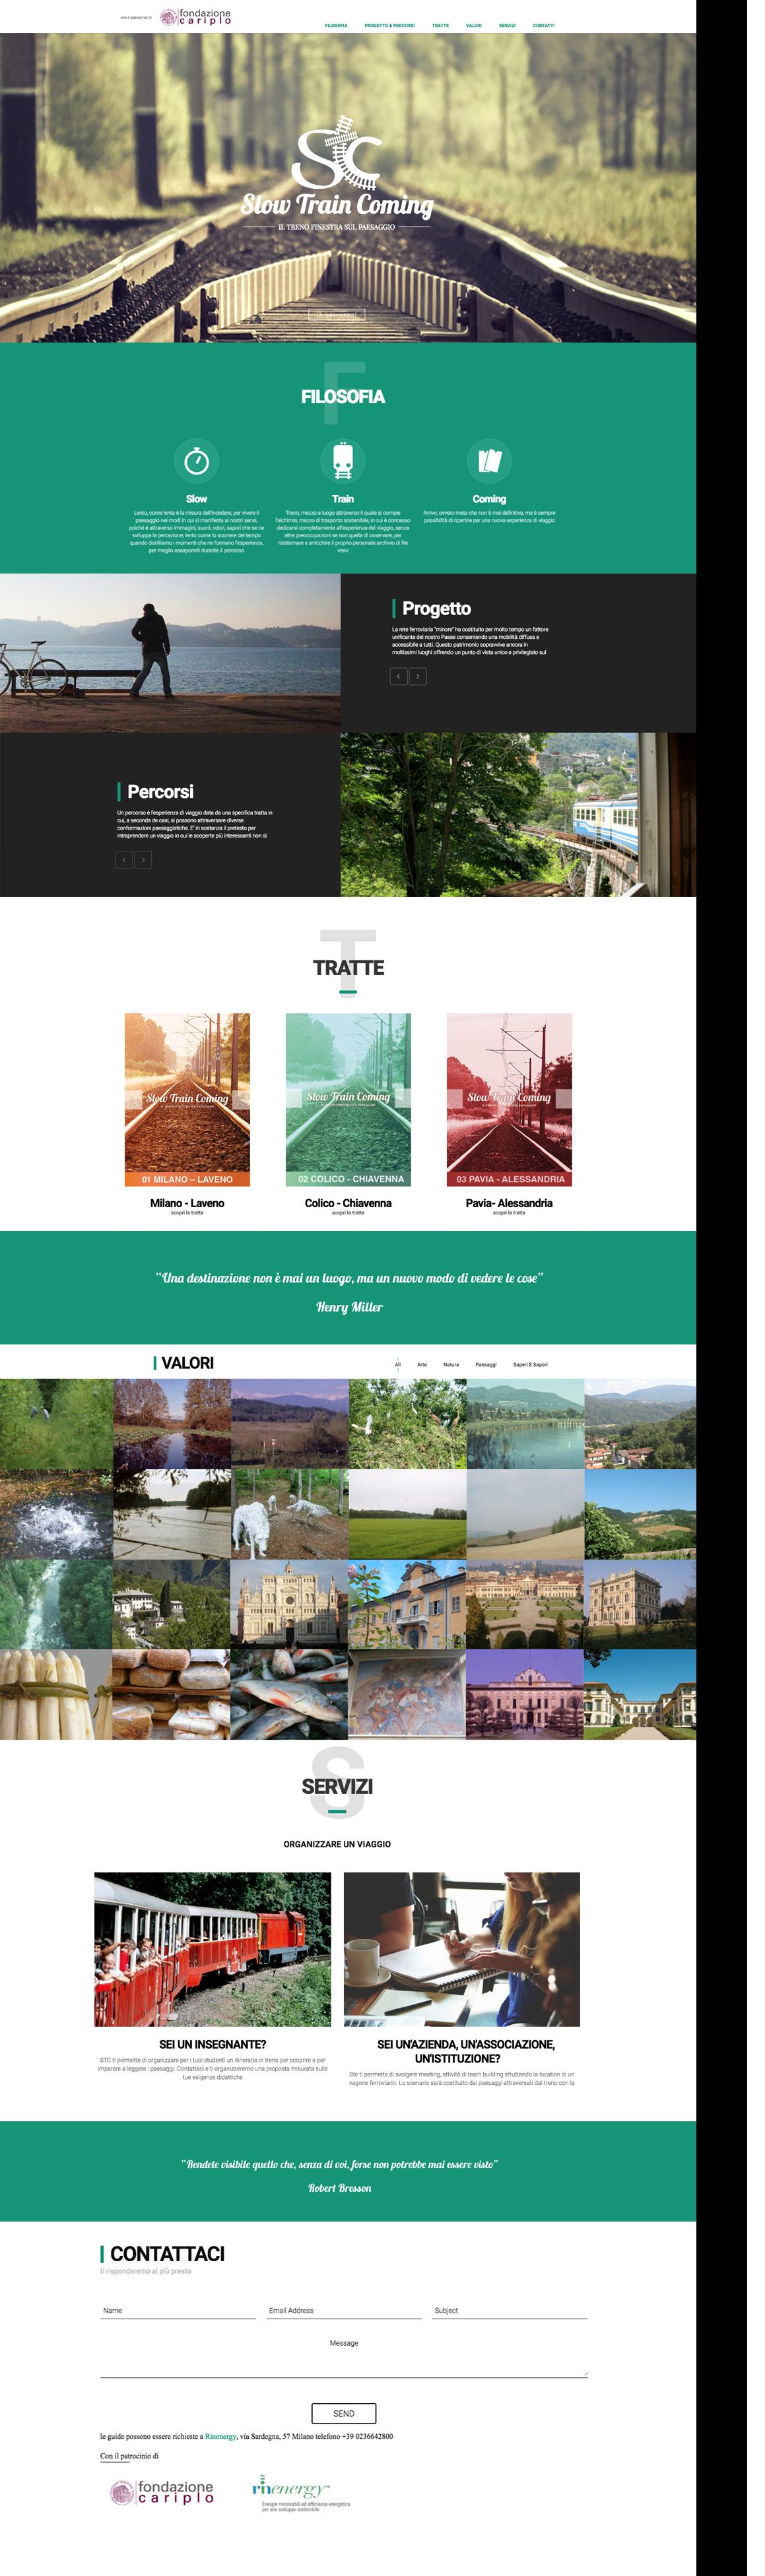 sito web rinenergy